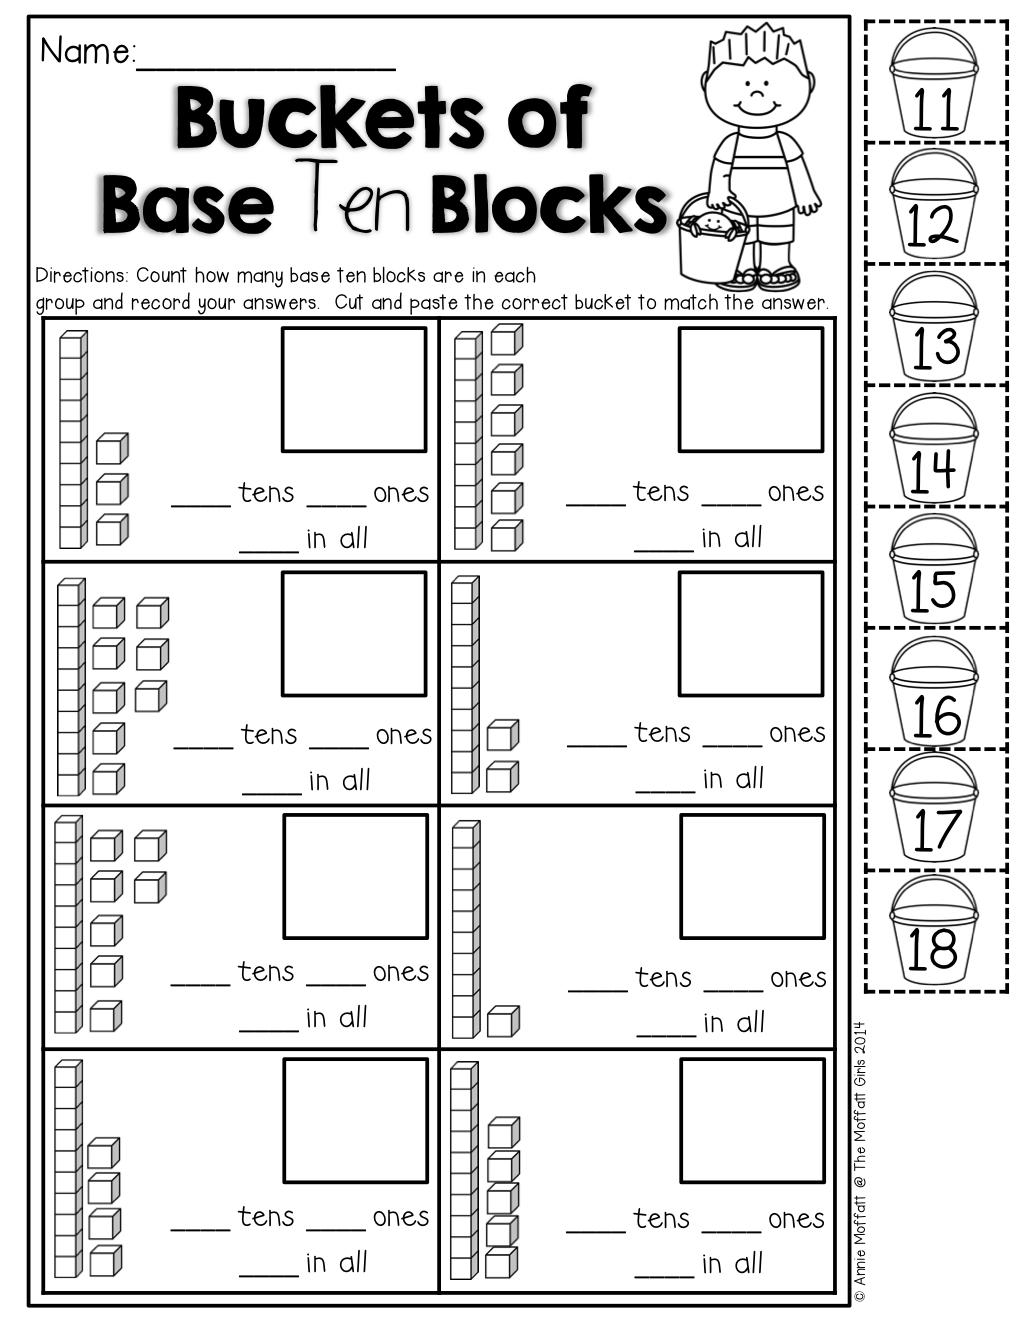 hight resolution of https://dubaikhalifas.com/first-grade-math-worksheets-base-10-blocks-k5-learning/